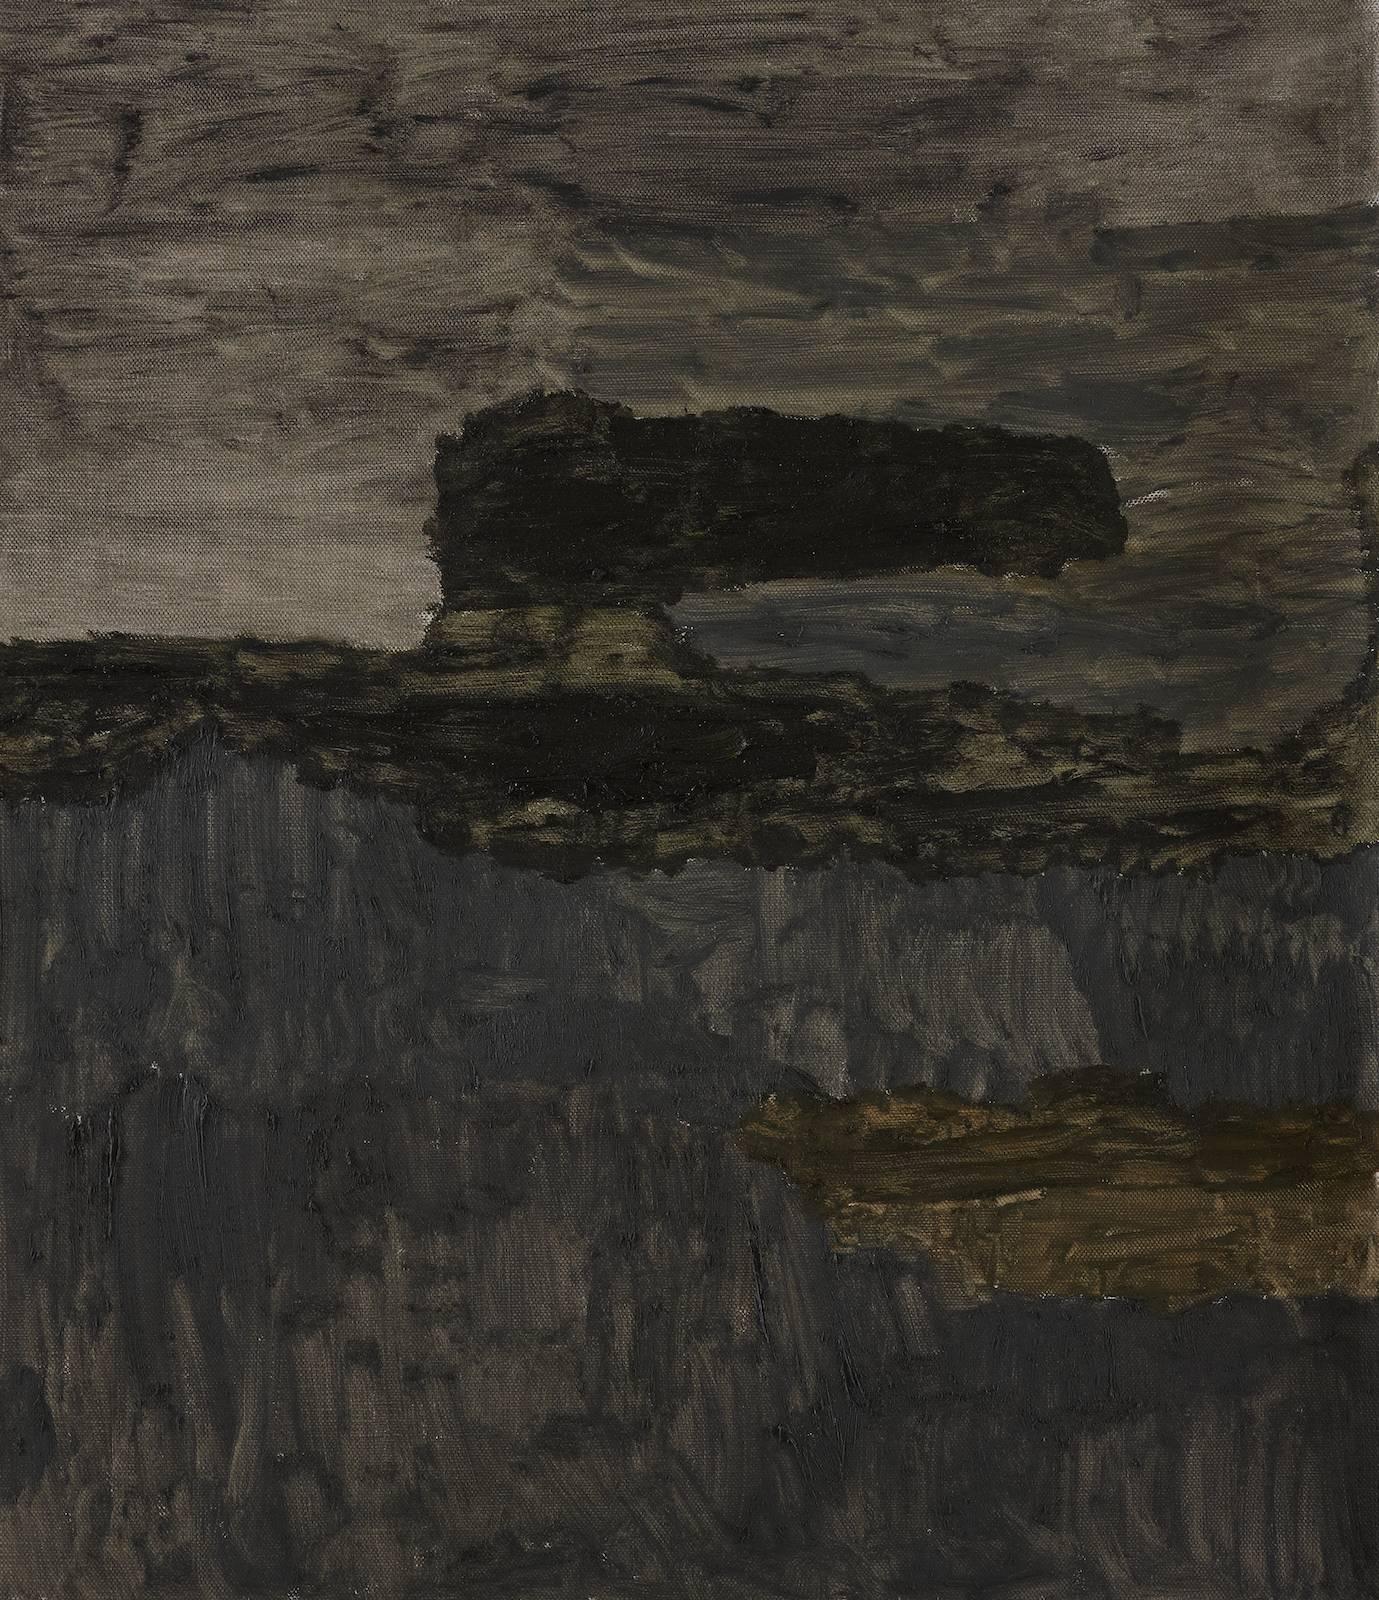 Landskap 7, 2012, oil on canvas, 74,5 x 64,5 cm